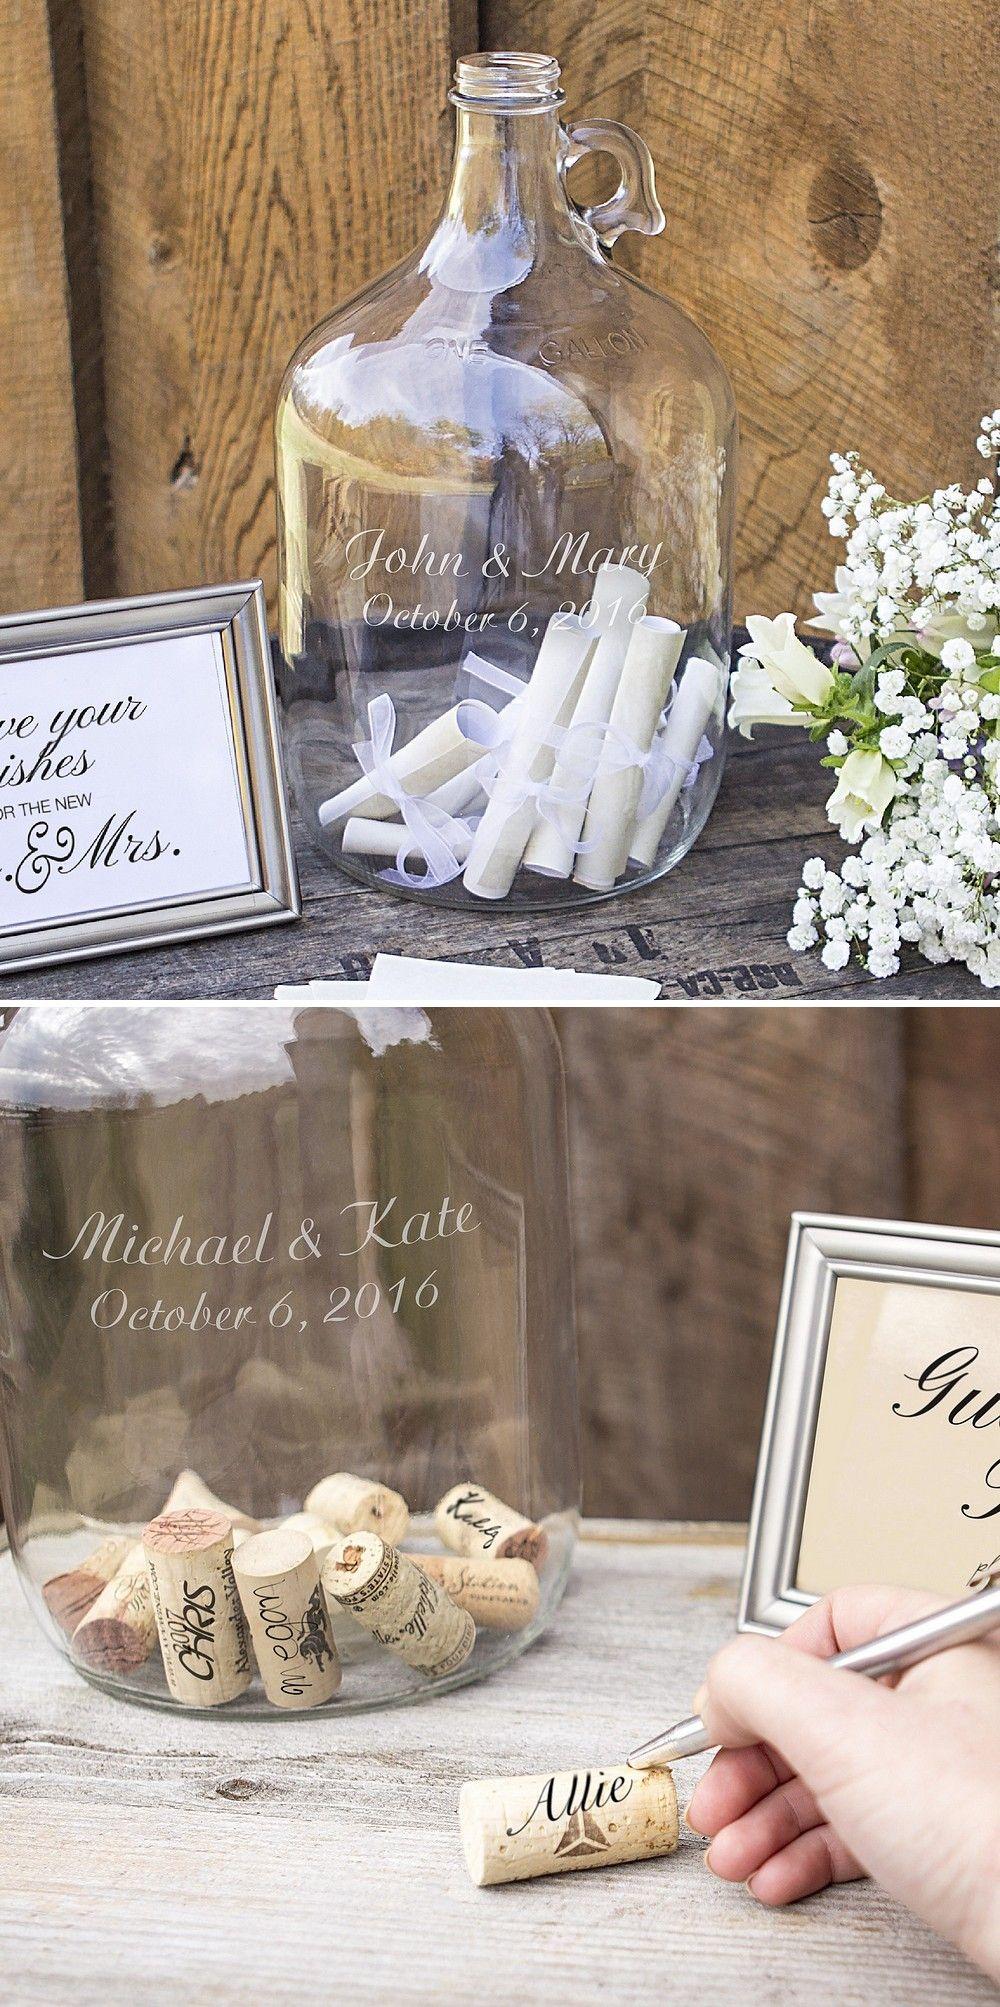 Wedding Wishes Personalized Glass Gallon Growler Wedding